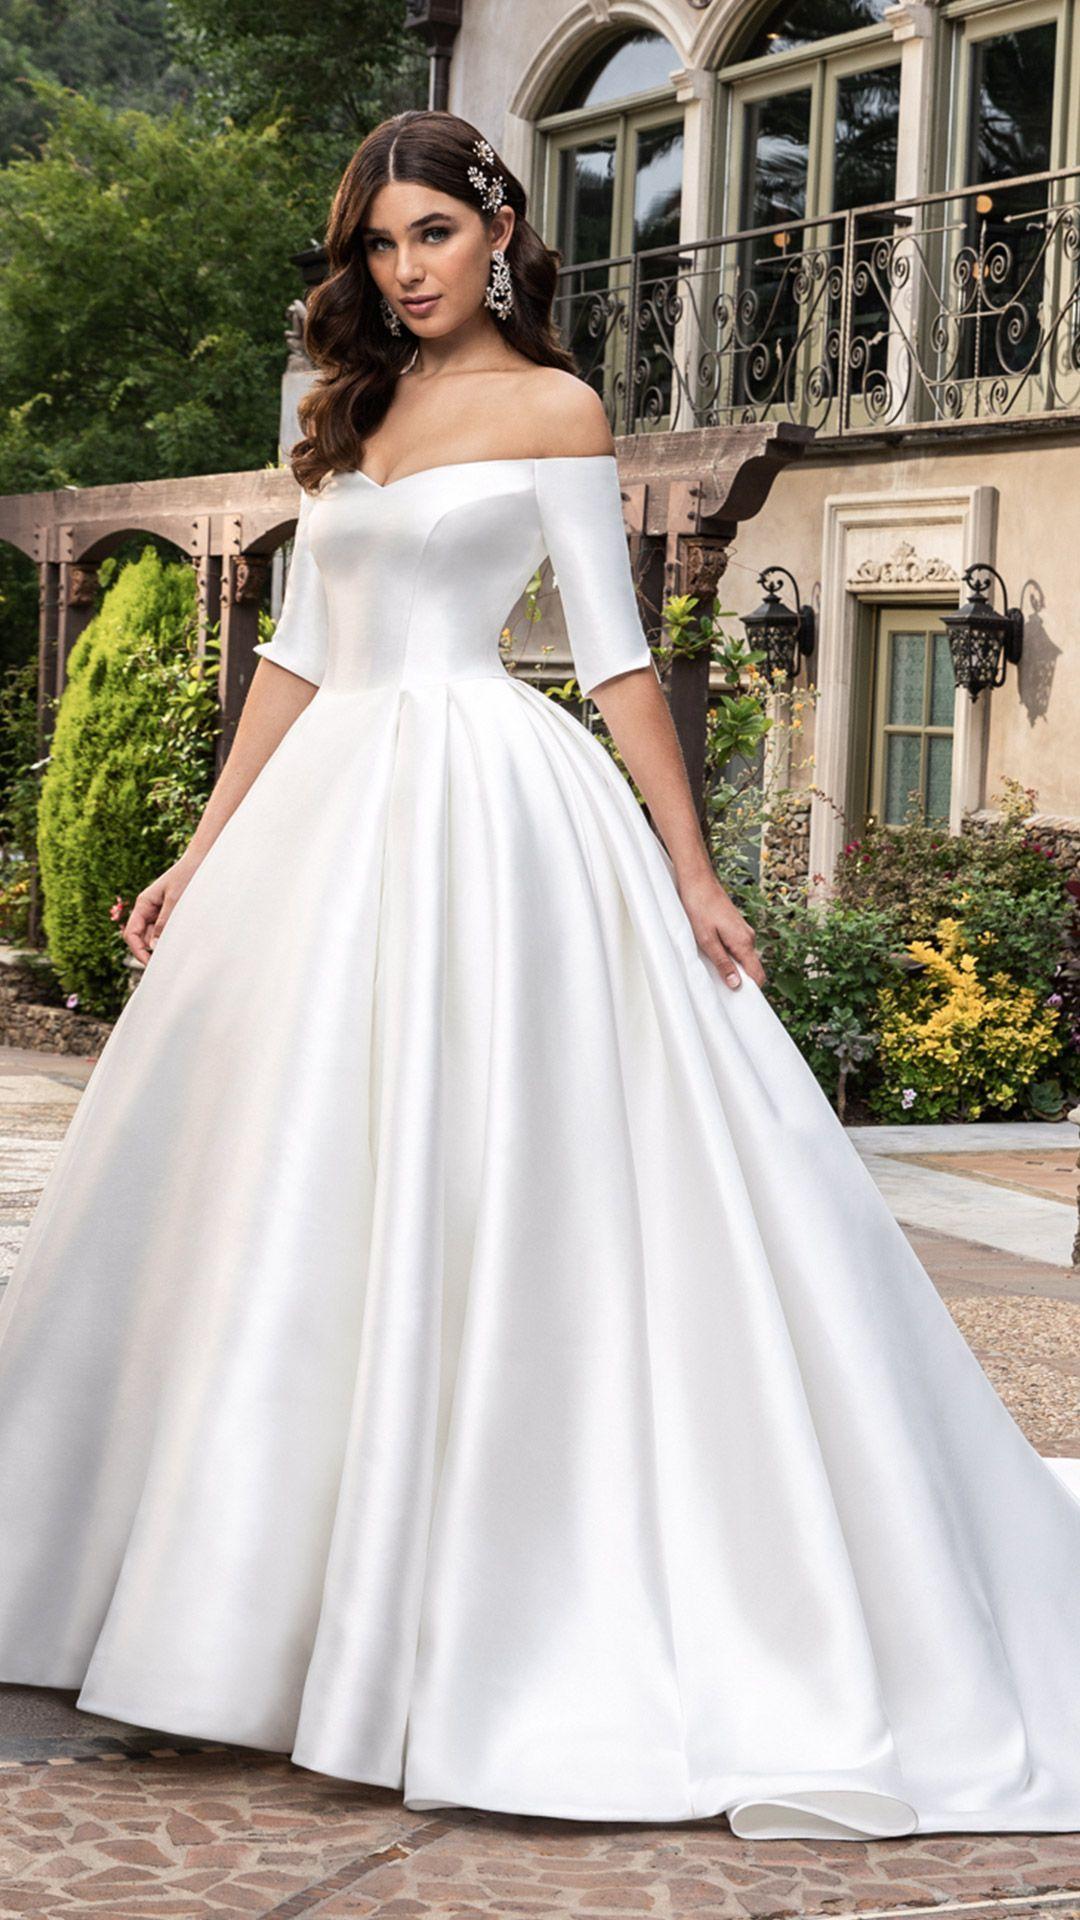 Style 2415 Macy White In 2020 Wedding Dress Silhouette Summer Wedding Dress Wedding Dresses